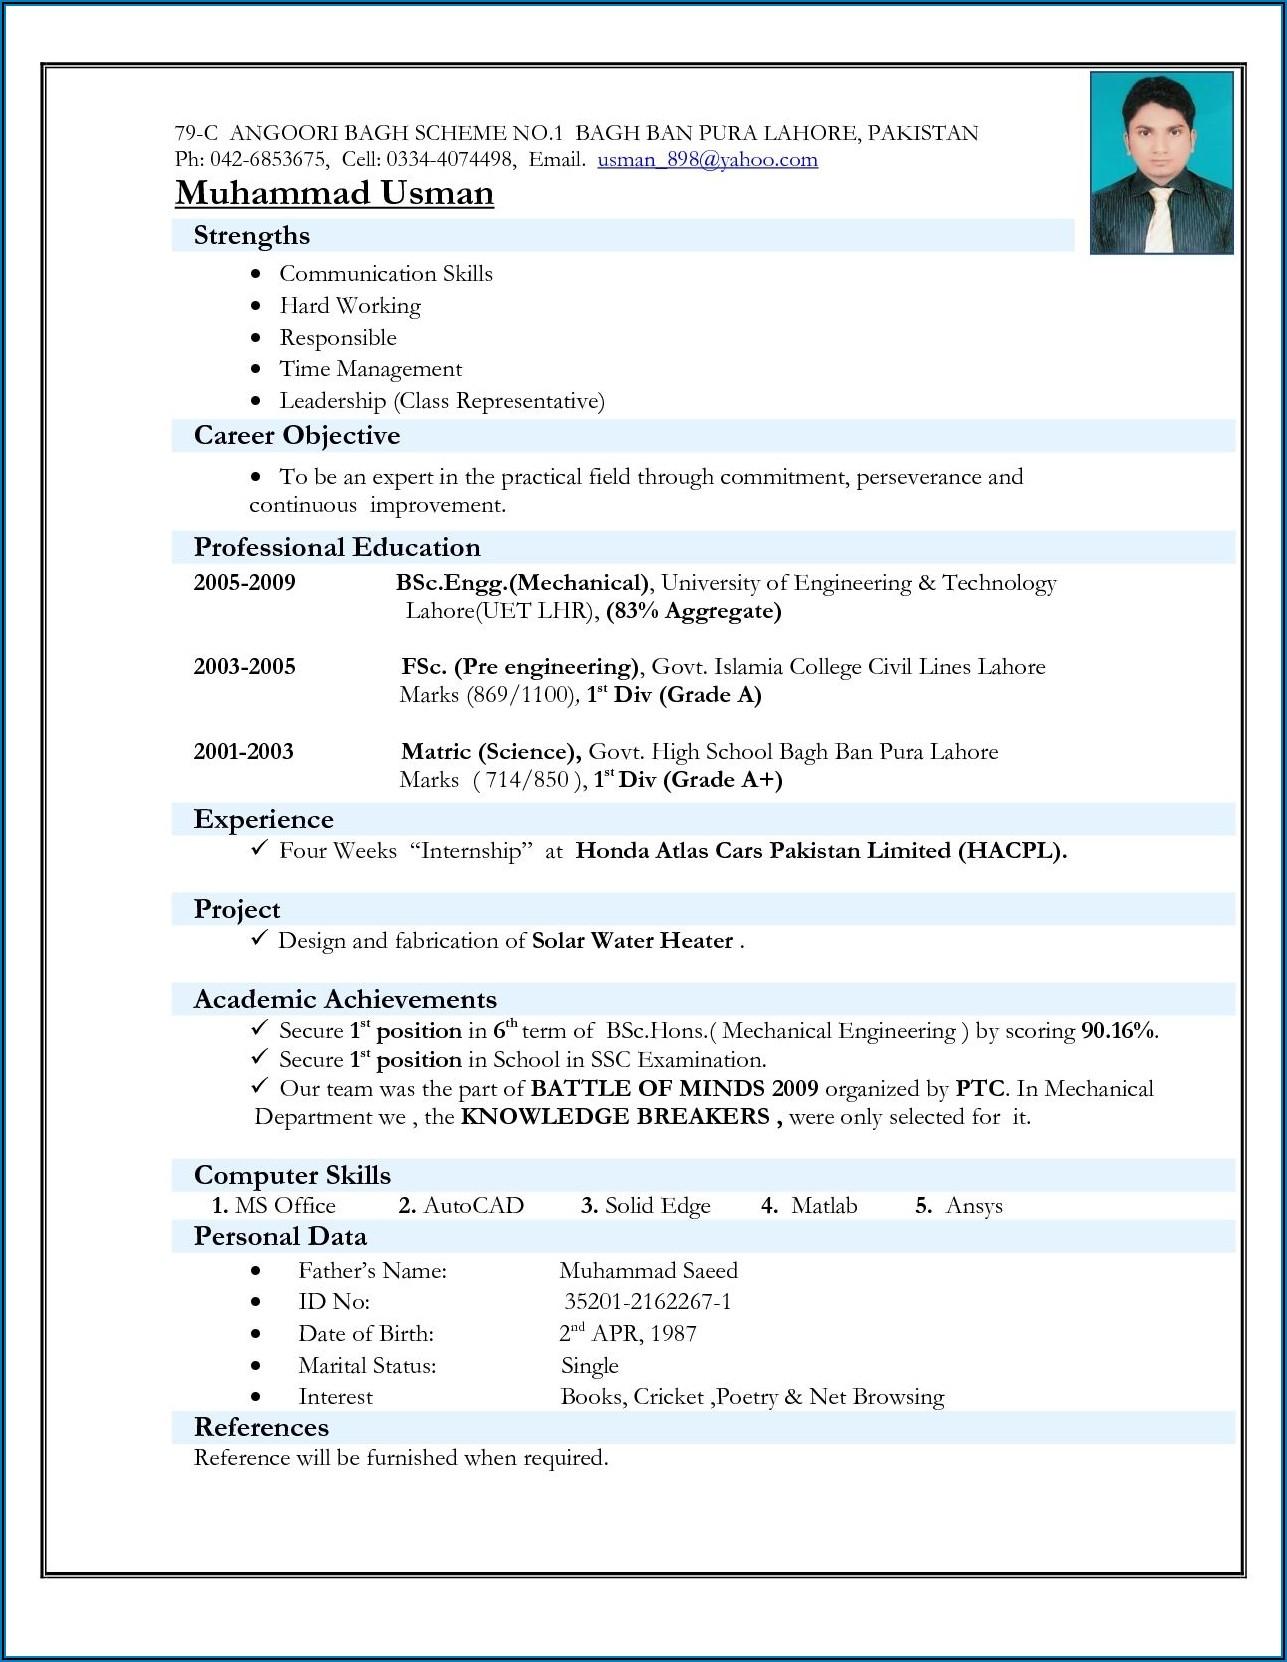 Cv Format In Ms Word 2007 Free Download Pakistan